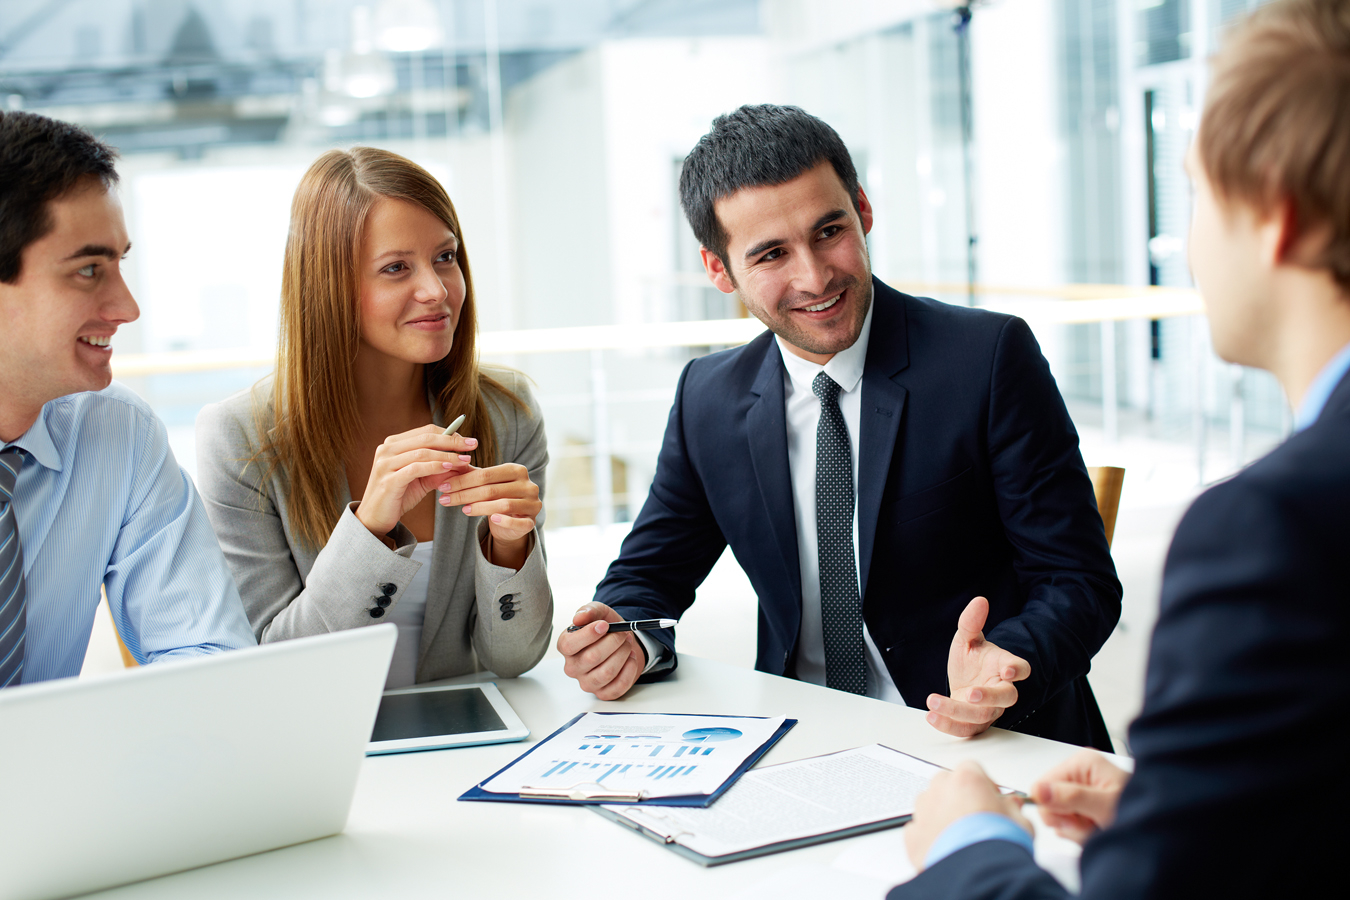 DB Recruiters / DHA / MOH / HAAD / UAE Healthcare Recruitment / DB